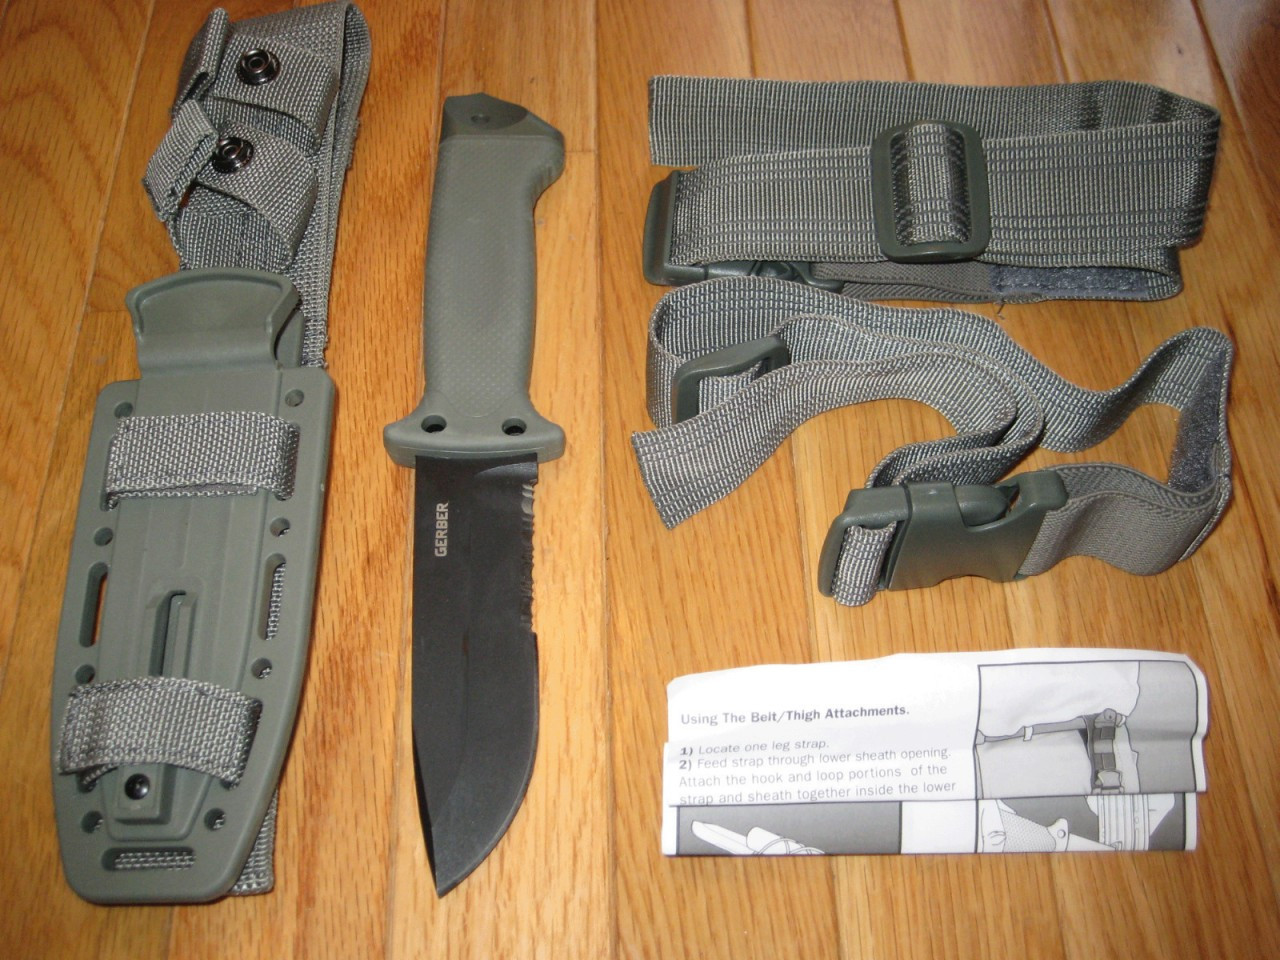 75138e1f5f7 ... Gerber LMF II Infantry Survival Knife Foliage Green. Image 1